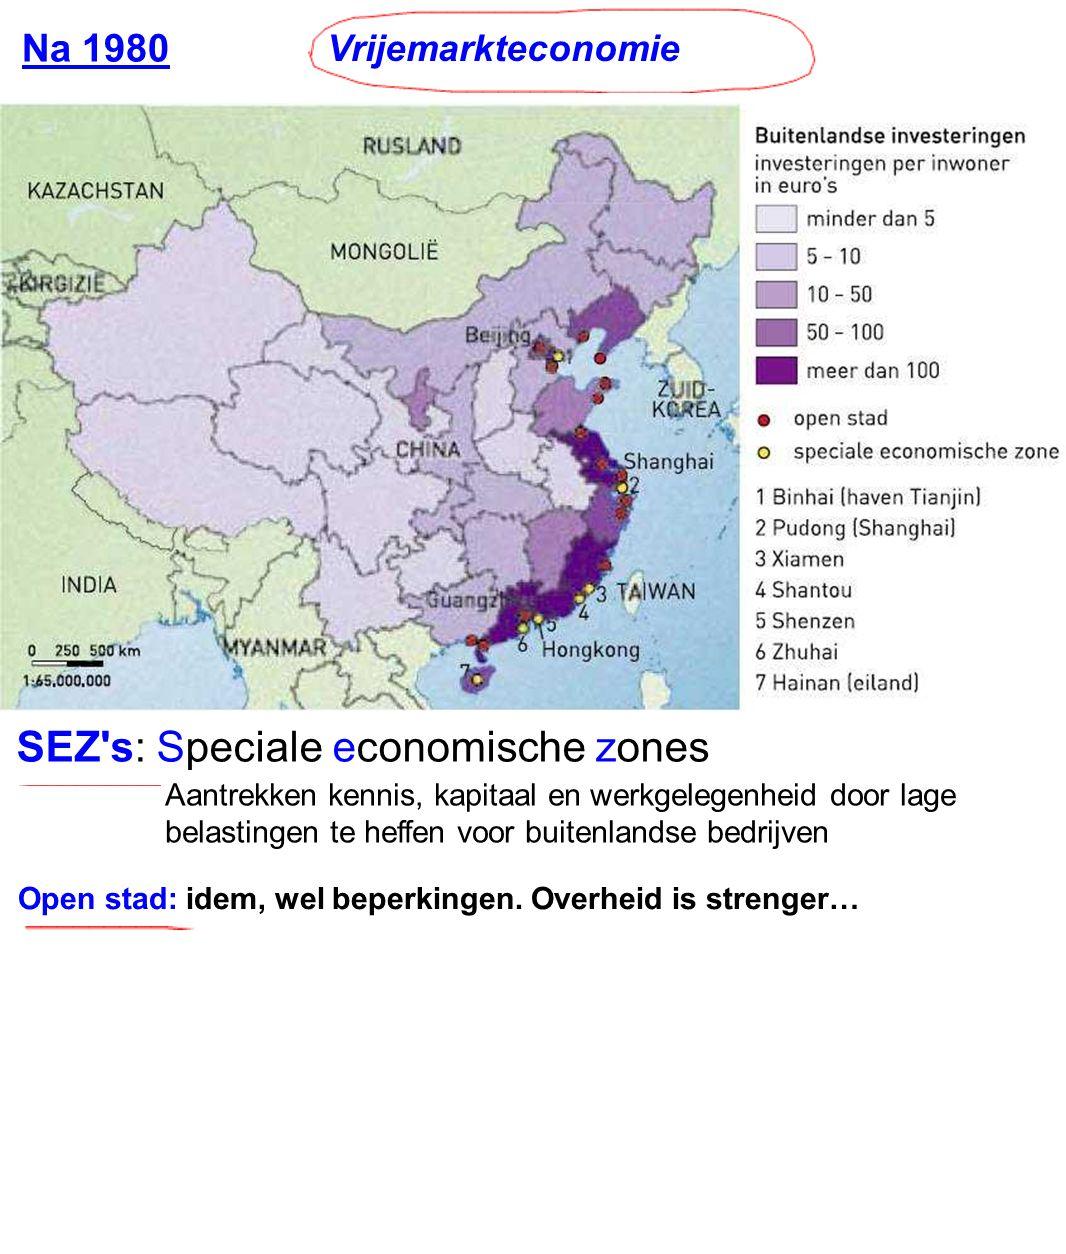 Welvaartskloof in China